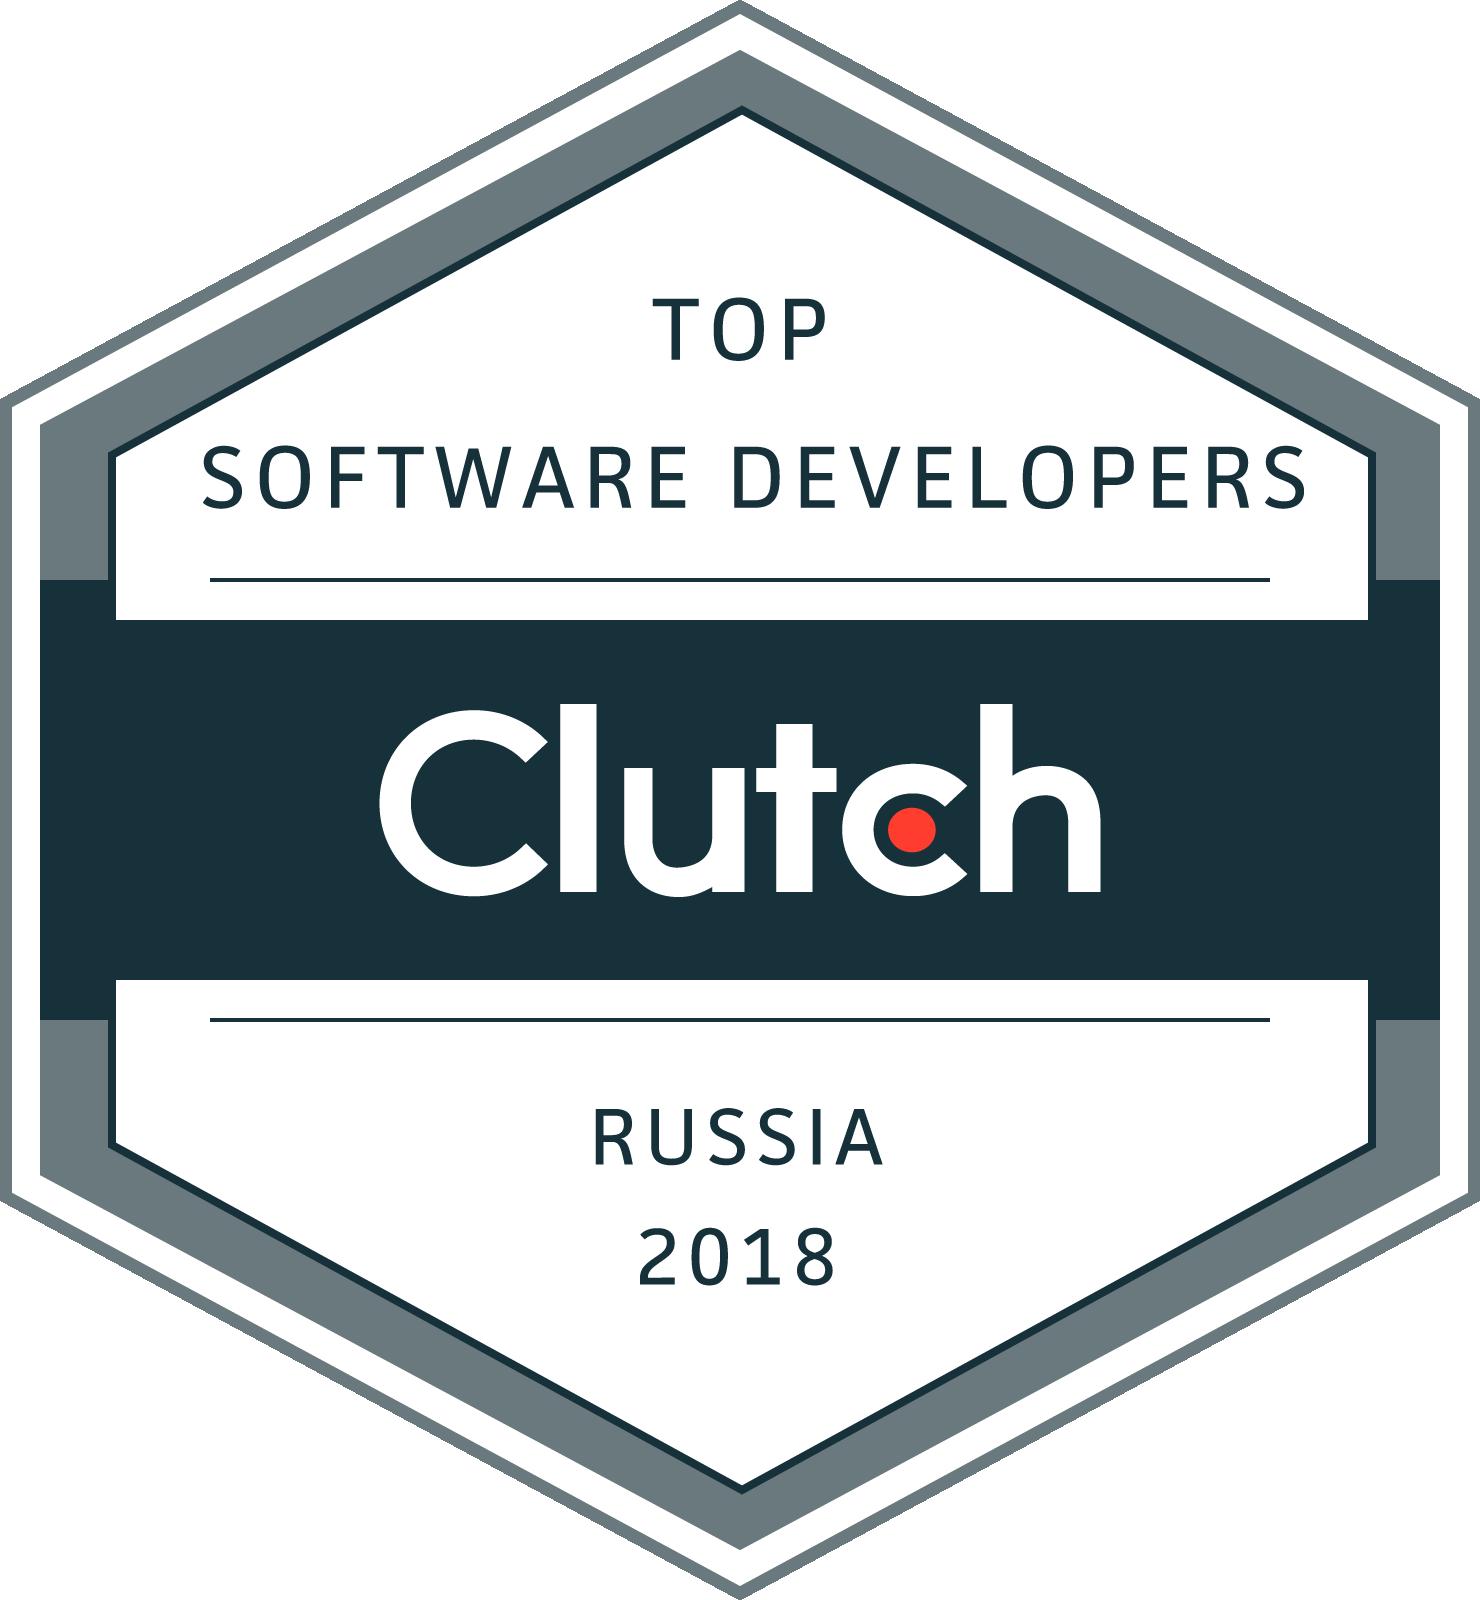 Software Developers Russia Clutch 2018